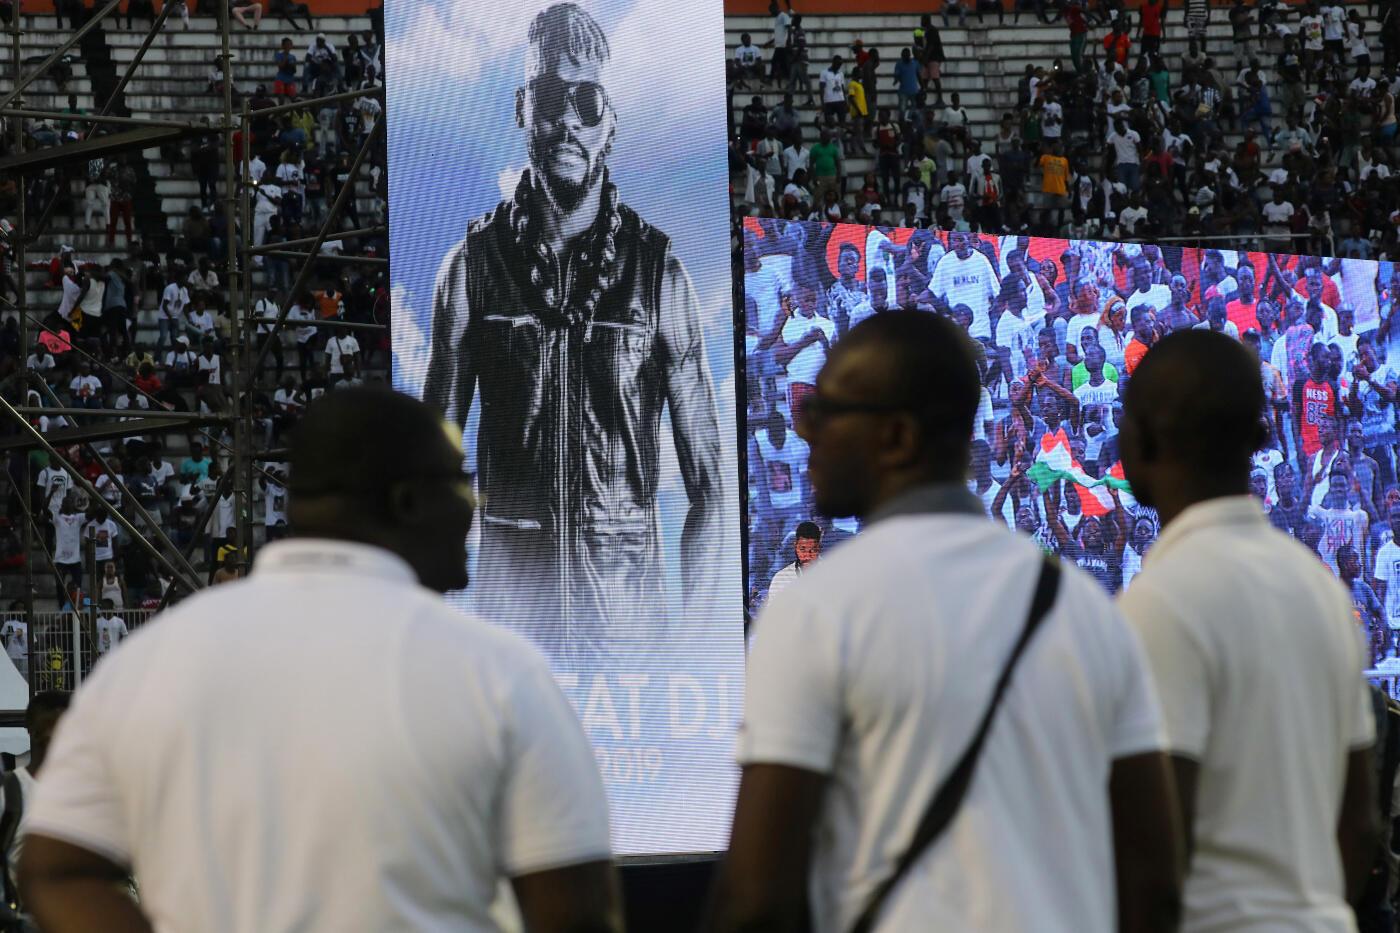 Tribute event for the late DJ Arafat at the Félix Houphouët-Boigny Stadium, Abidjian, Côte d'Ivoire, 30 August 2019.